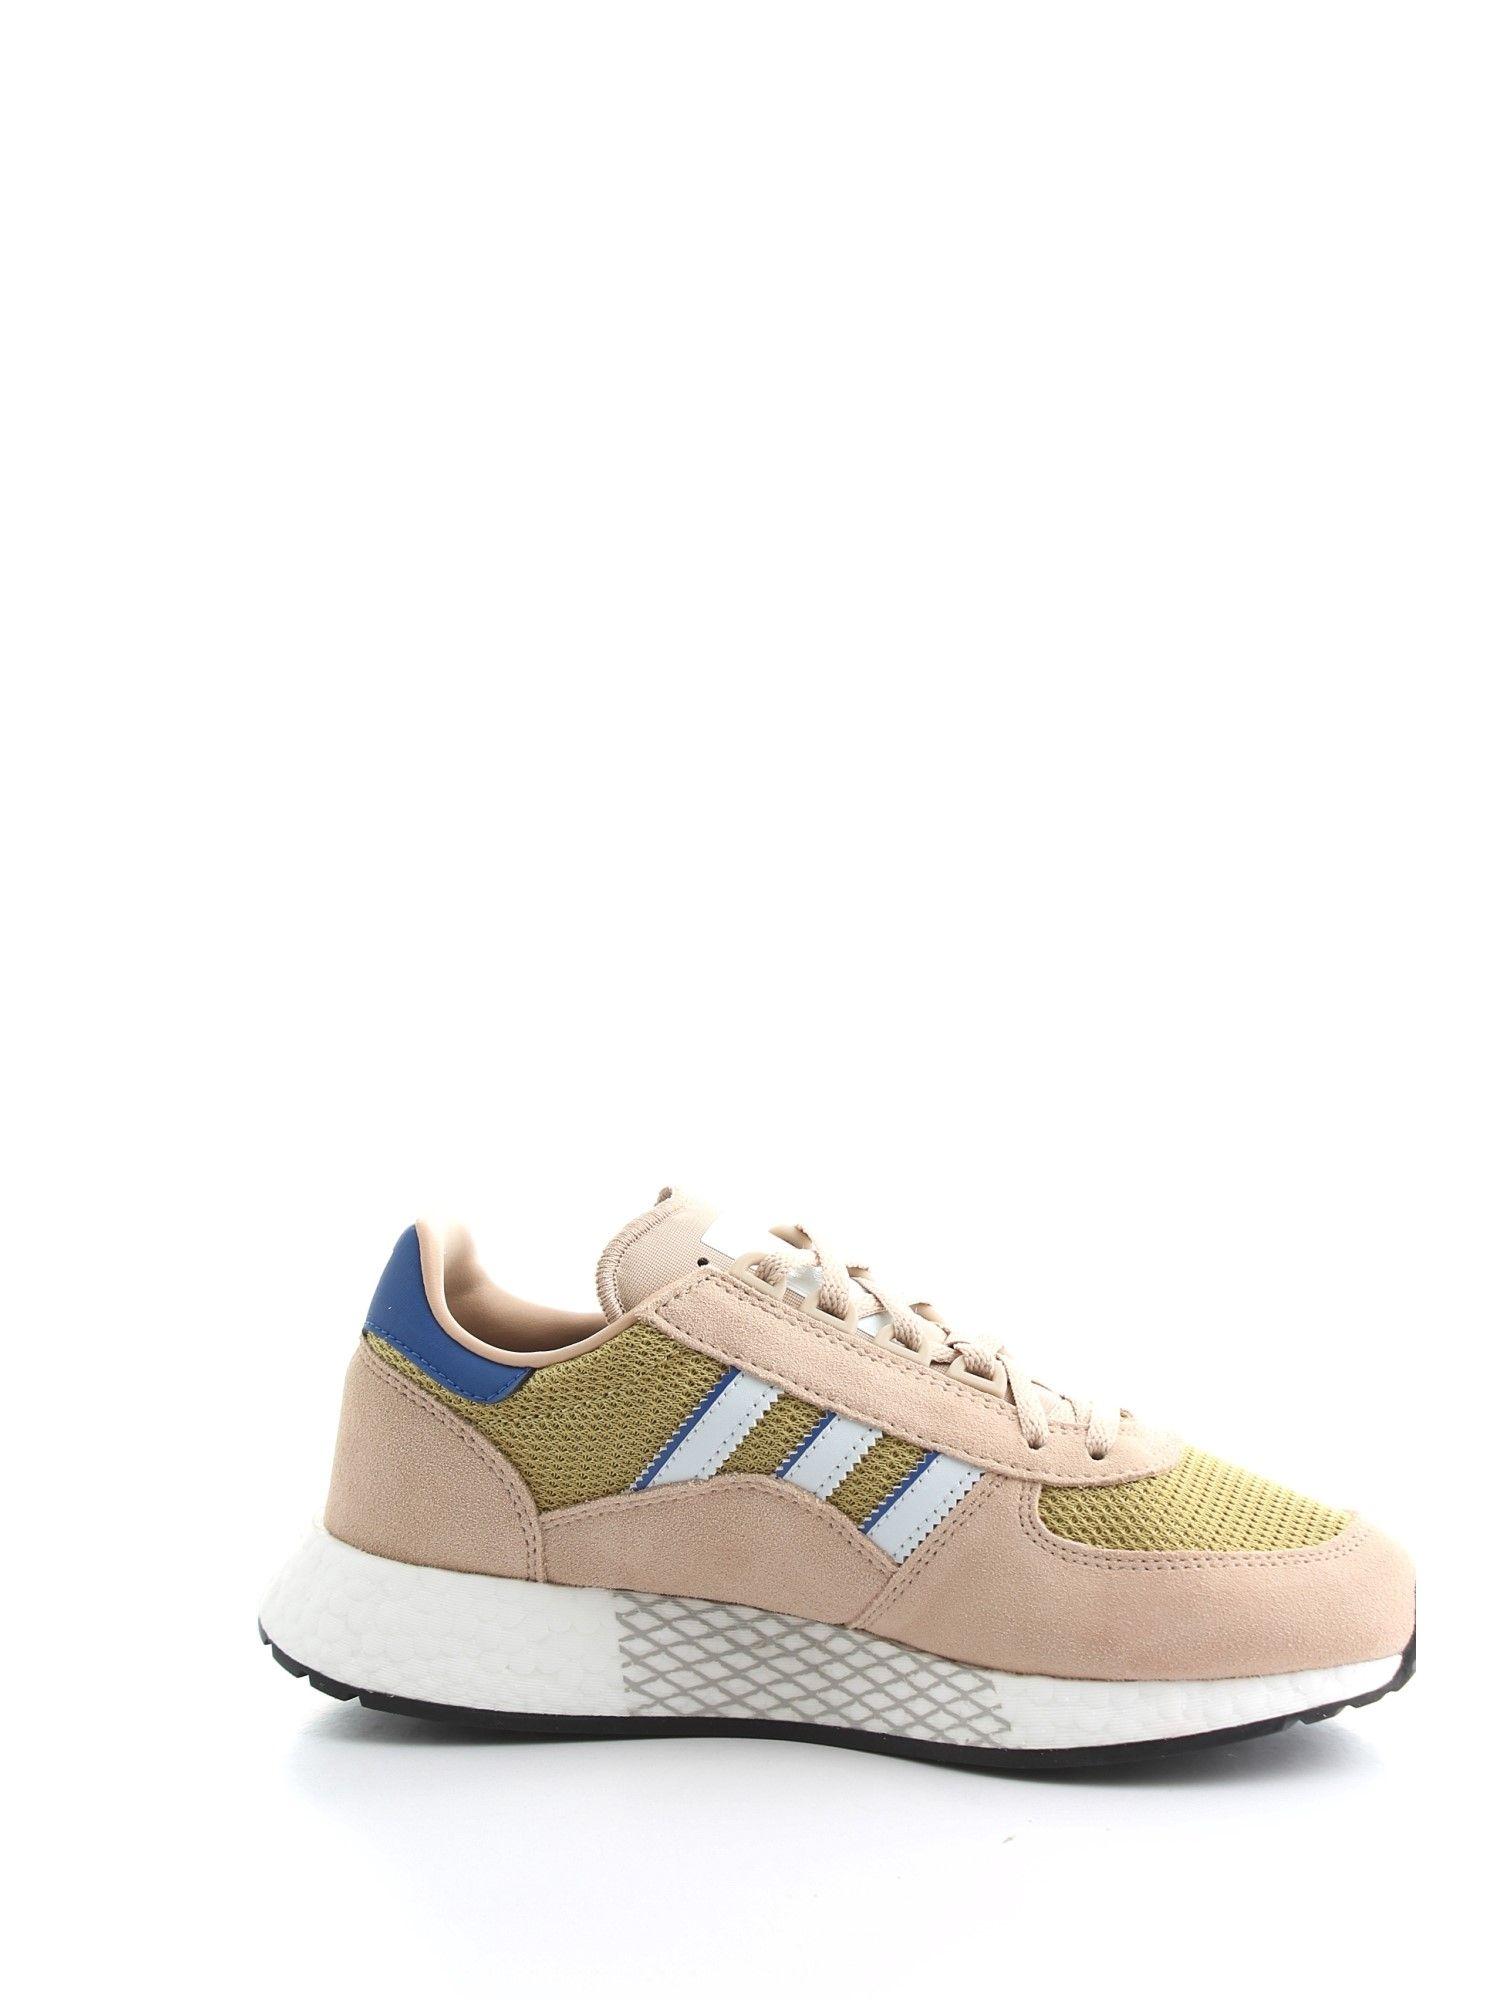 Adidas Originals Multicolor Leather Sneakers